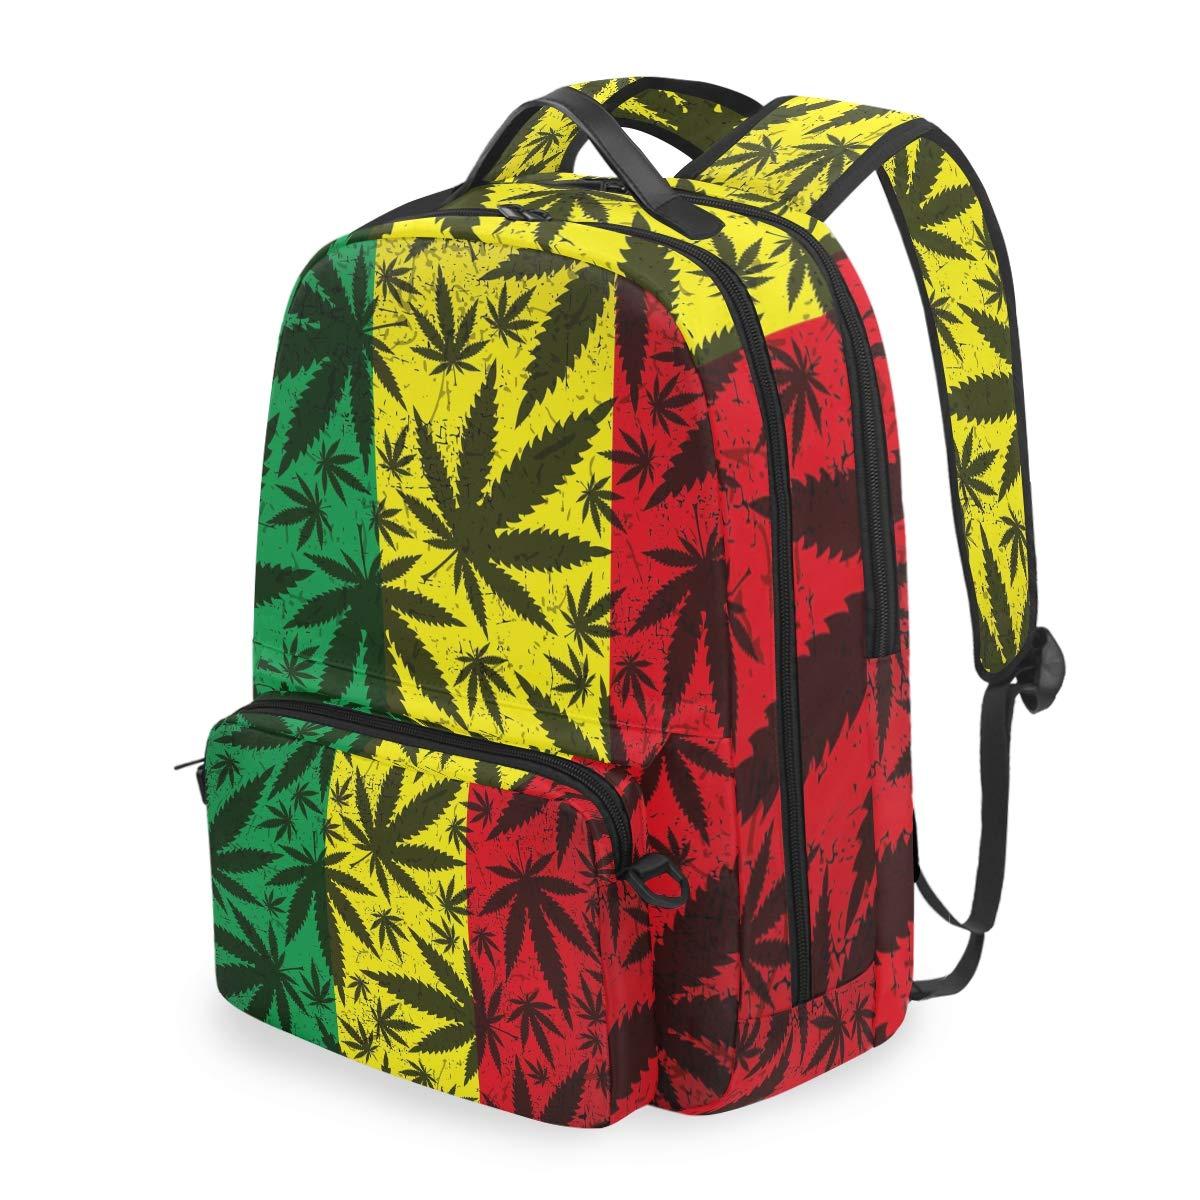 MAHU Backpack Marijuana Hemp Leaves Stripe Detachable College Bag Travel Zipper Bookbag Hiking Shoulder Crossbody Bag Daypack for Women Men